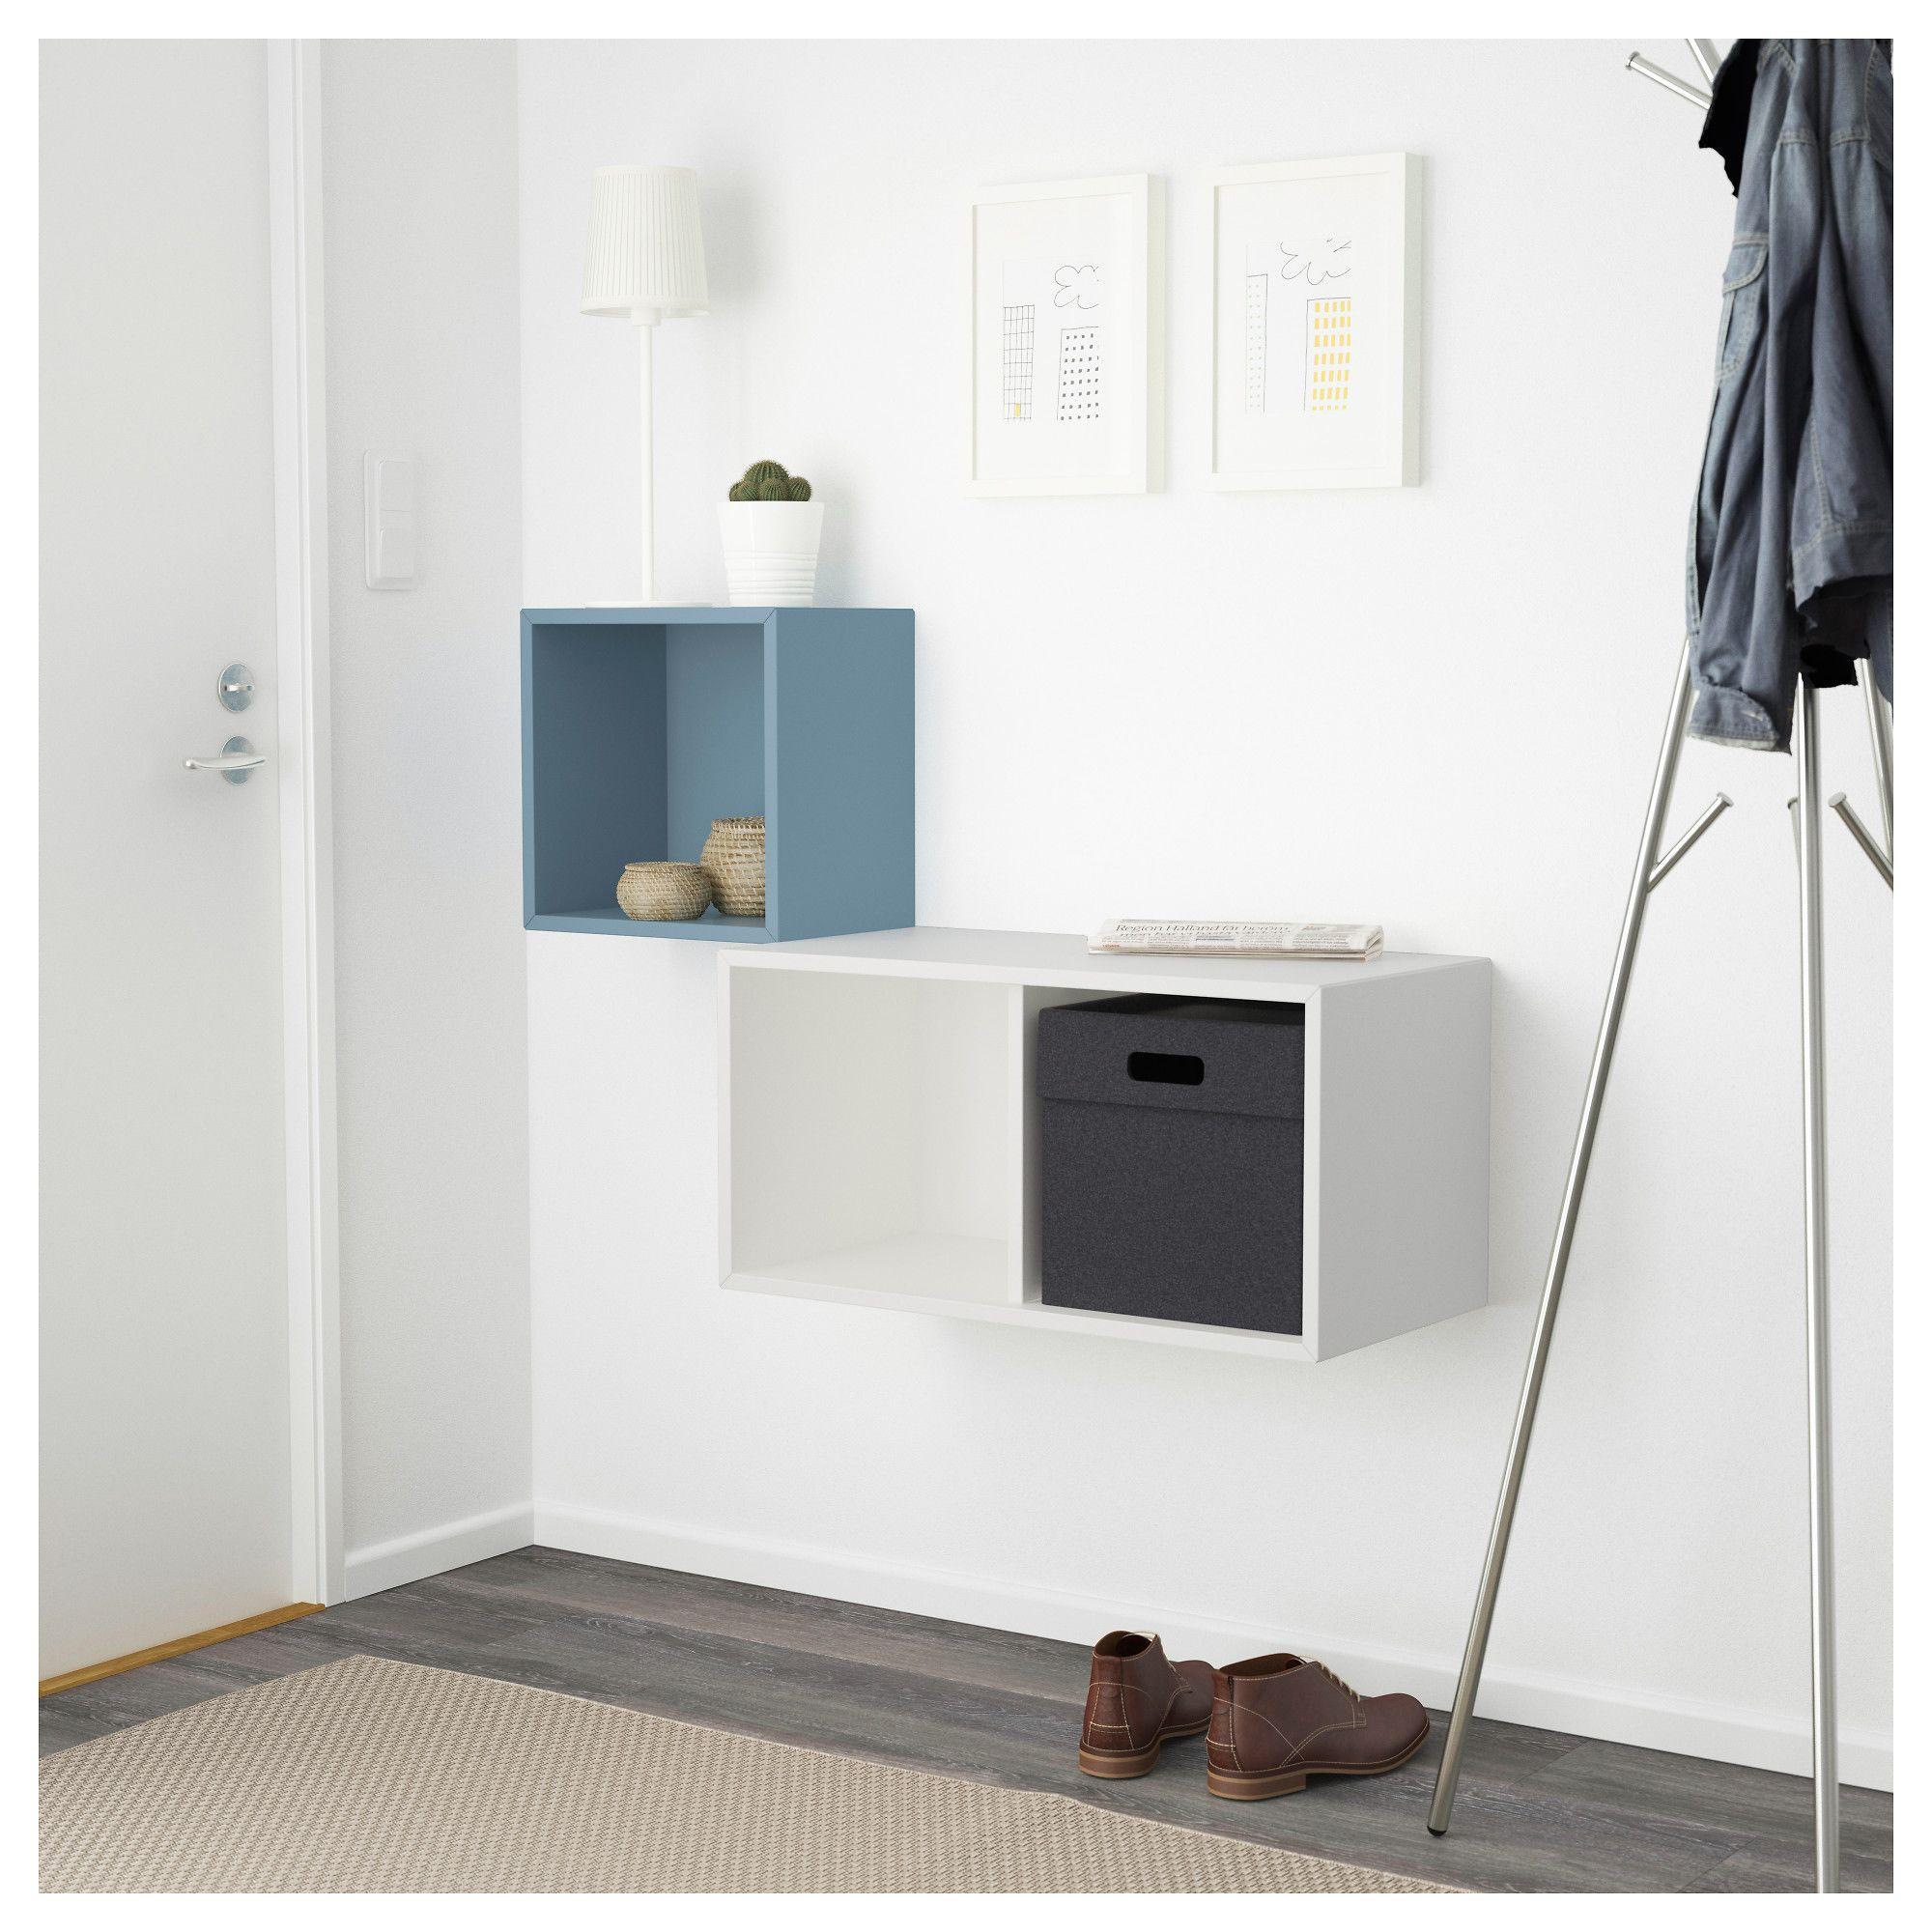 Furniture and Home Furnishings Arredo bagno blu